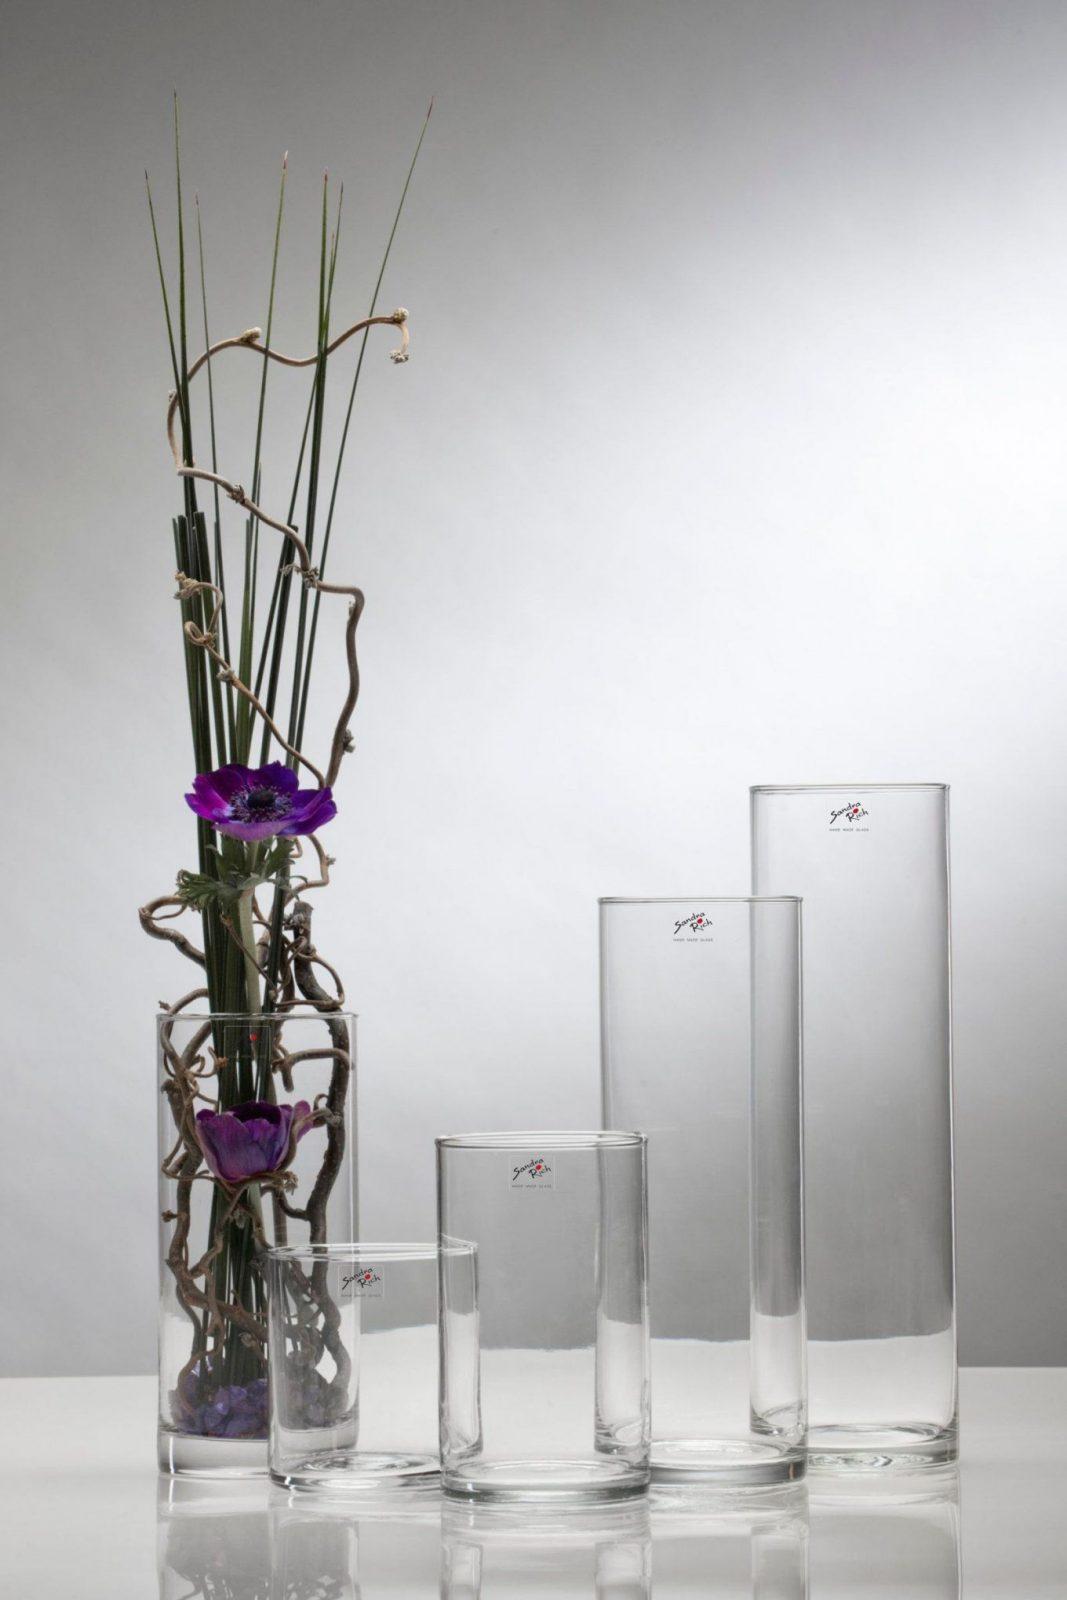 100 Bodenvase Dekorieren Frühling Bilder Ideen von Hohe Glasvase Dekorieren Ideen Bild